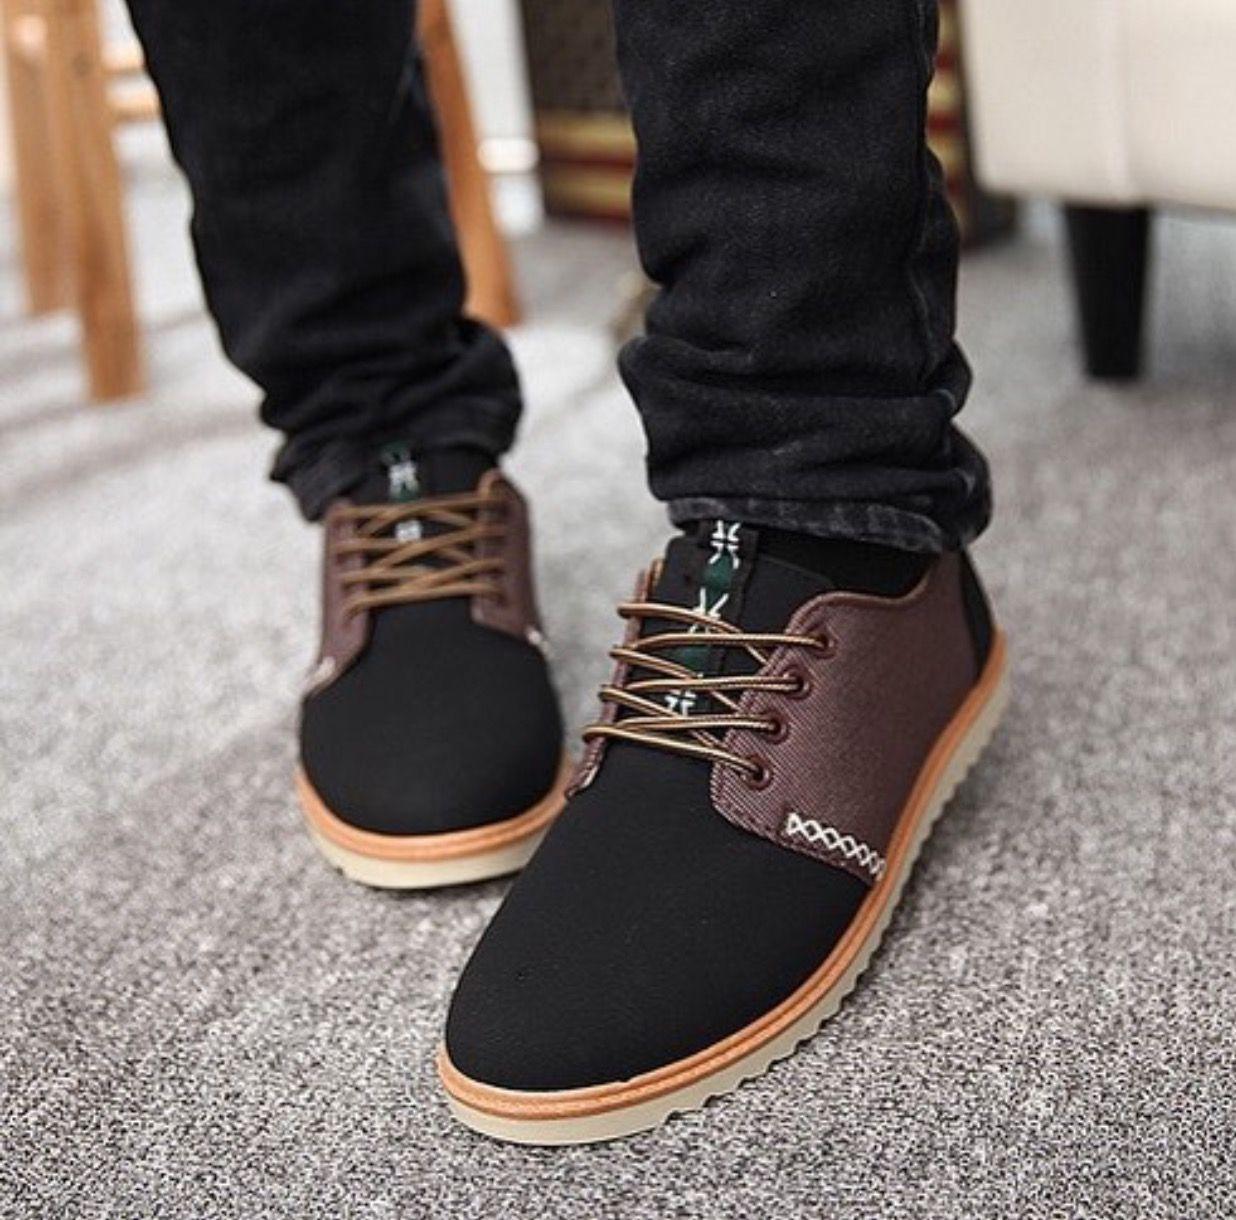 buy popular e872c 5ce23 Yeah ya did.....kickslogix.com Men Dress, Dress Shoes